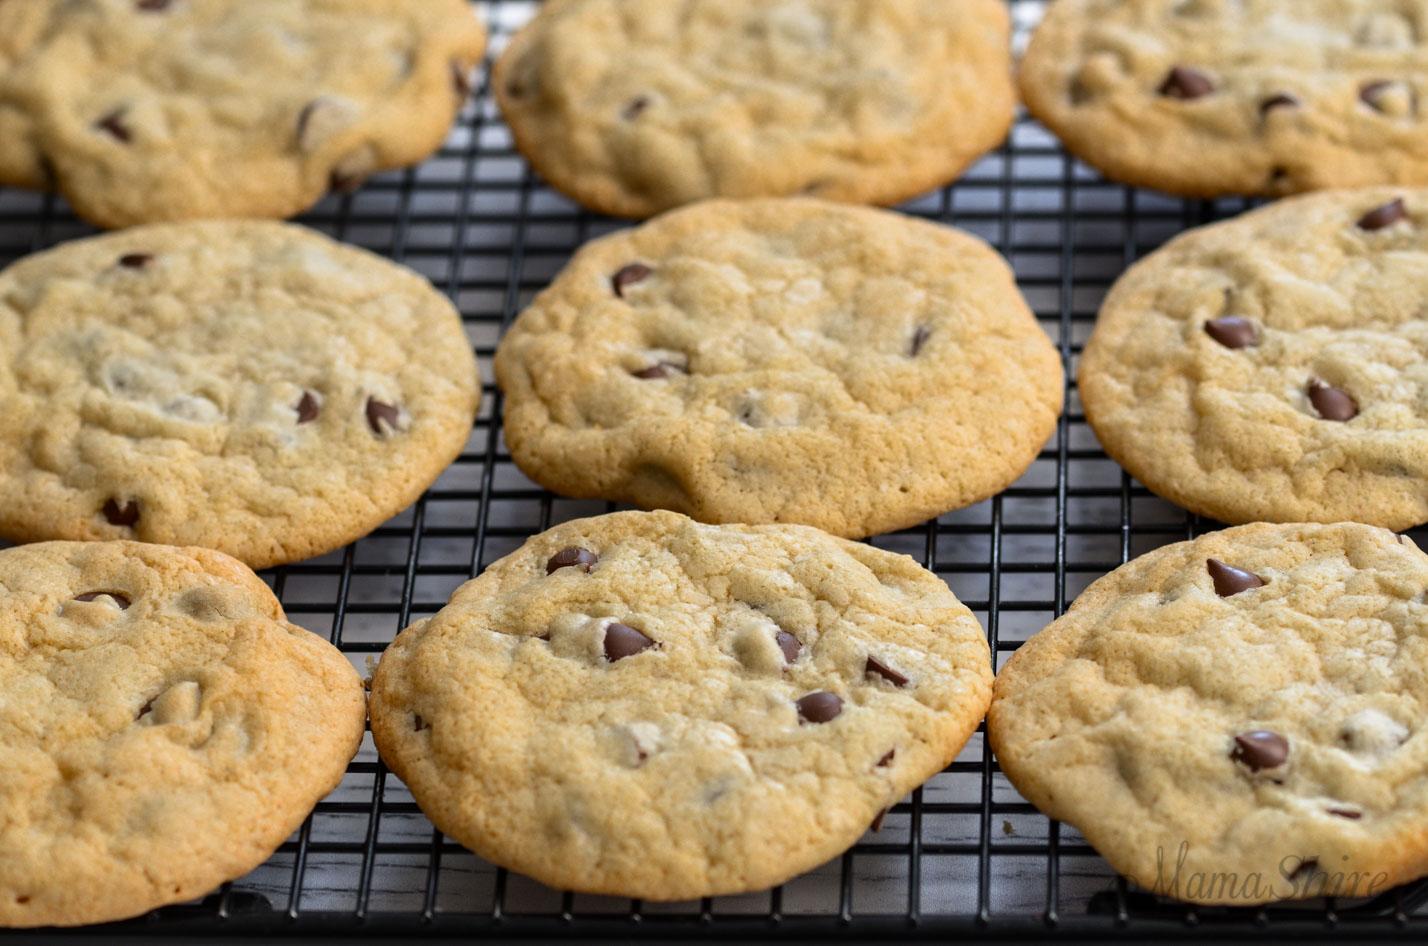 Delicious gluten-free cookie.